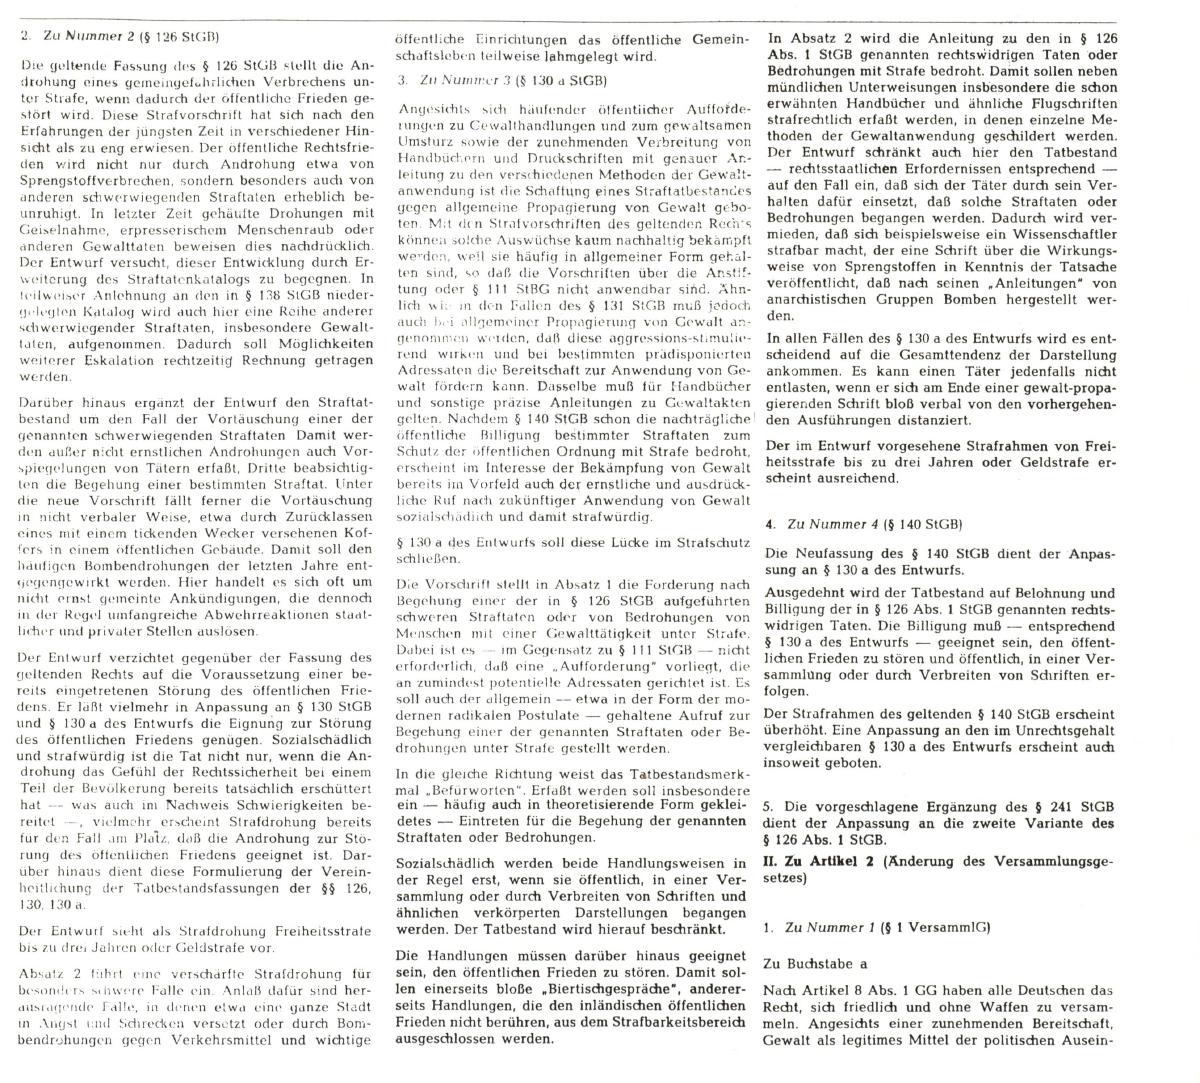 REP_VLB_1976_Die_Zensurgesetze_54